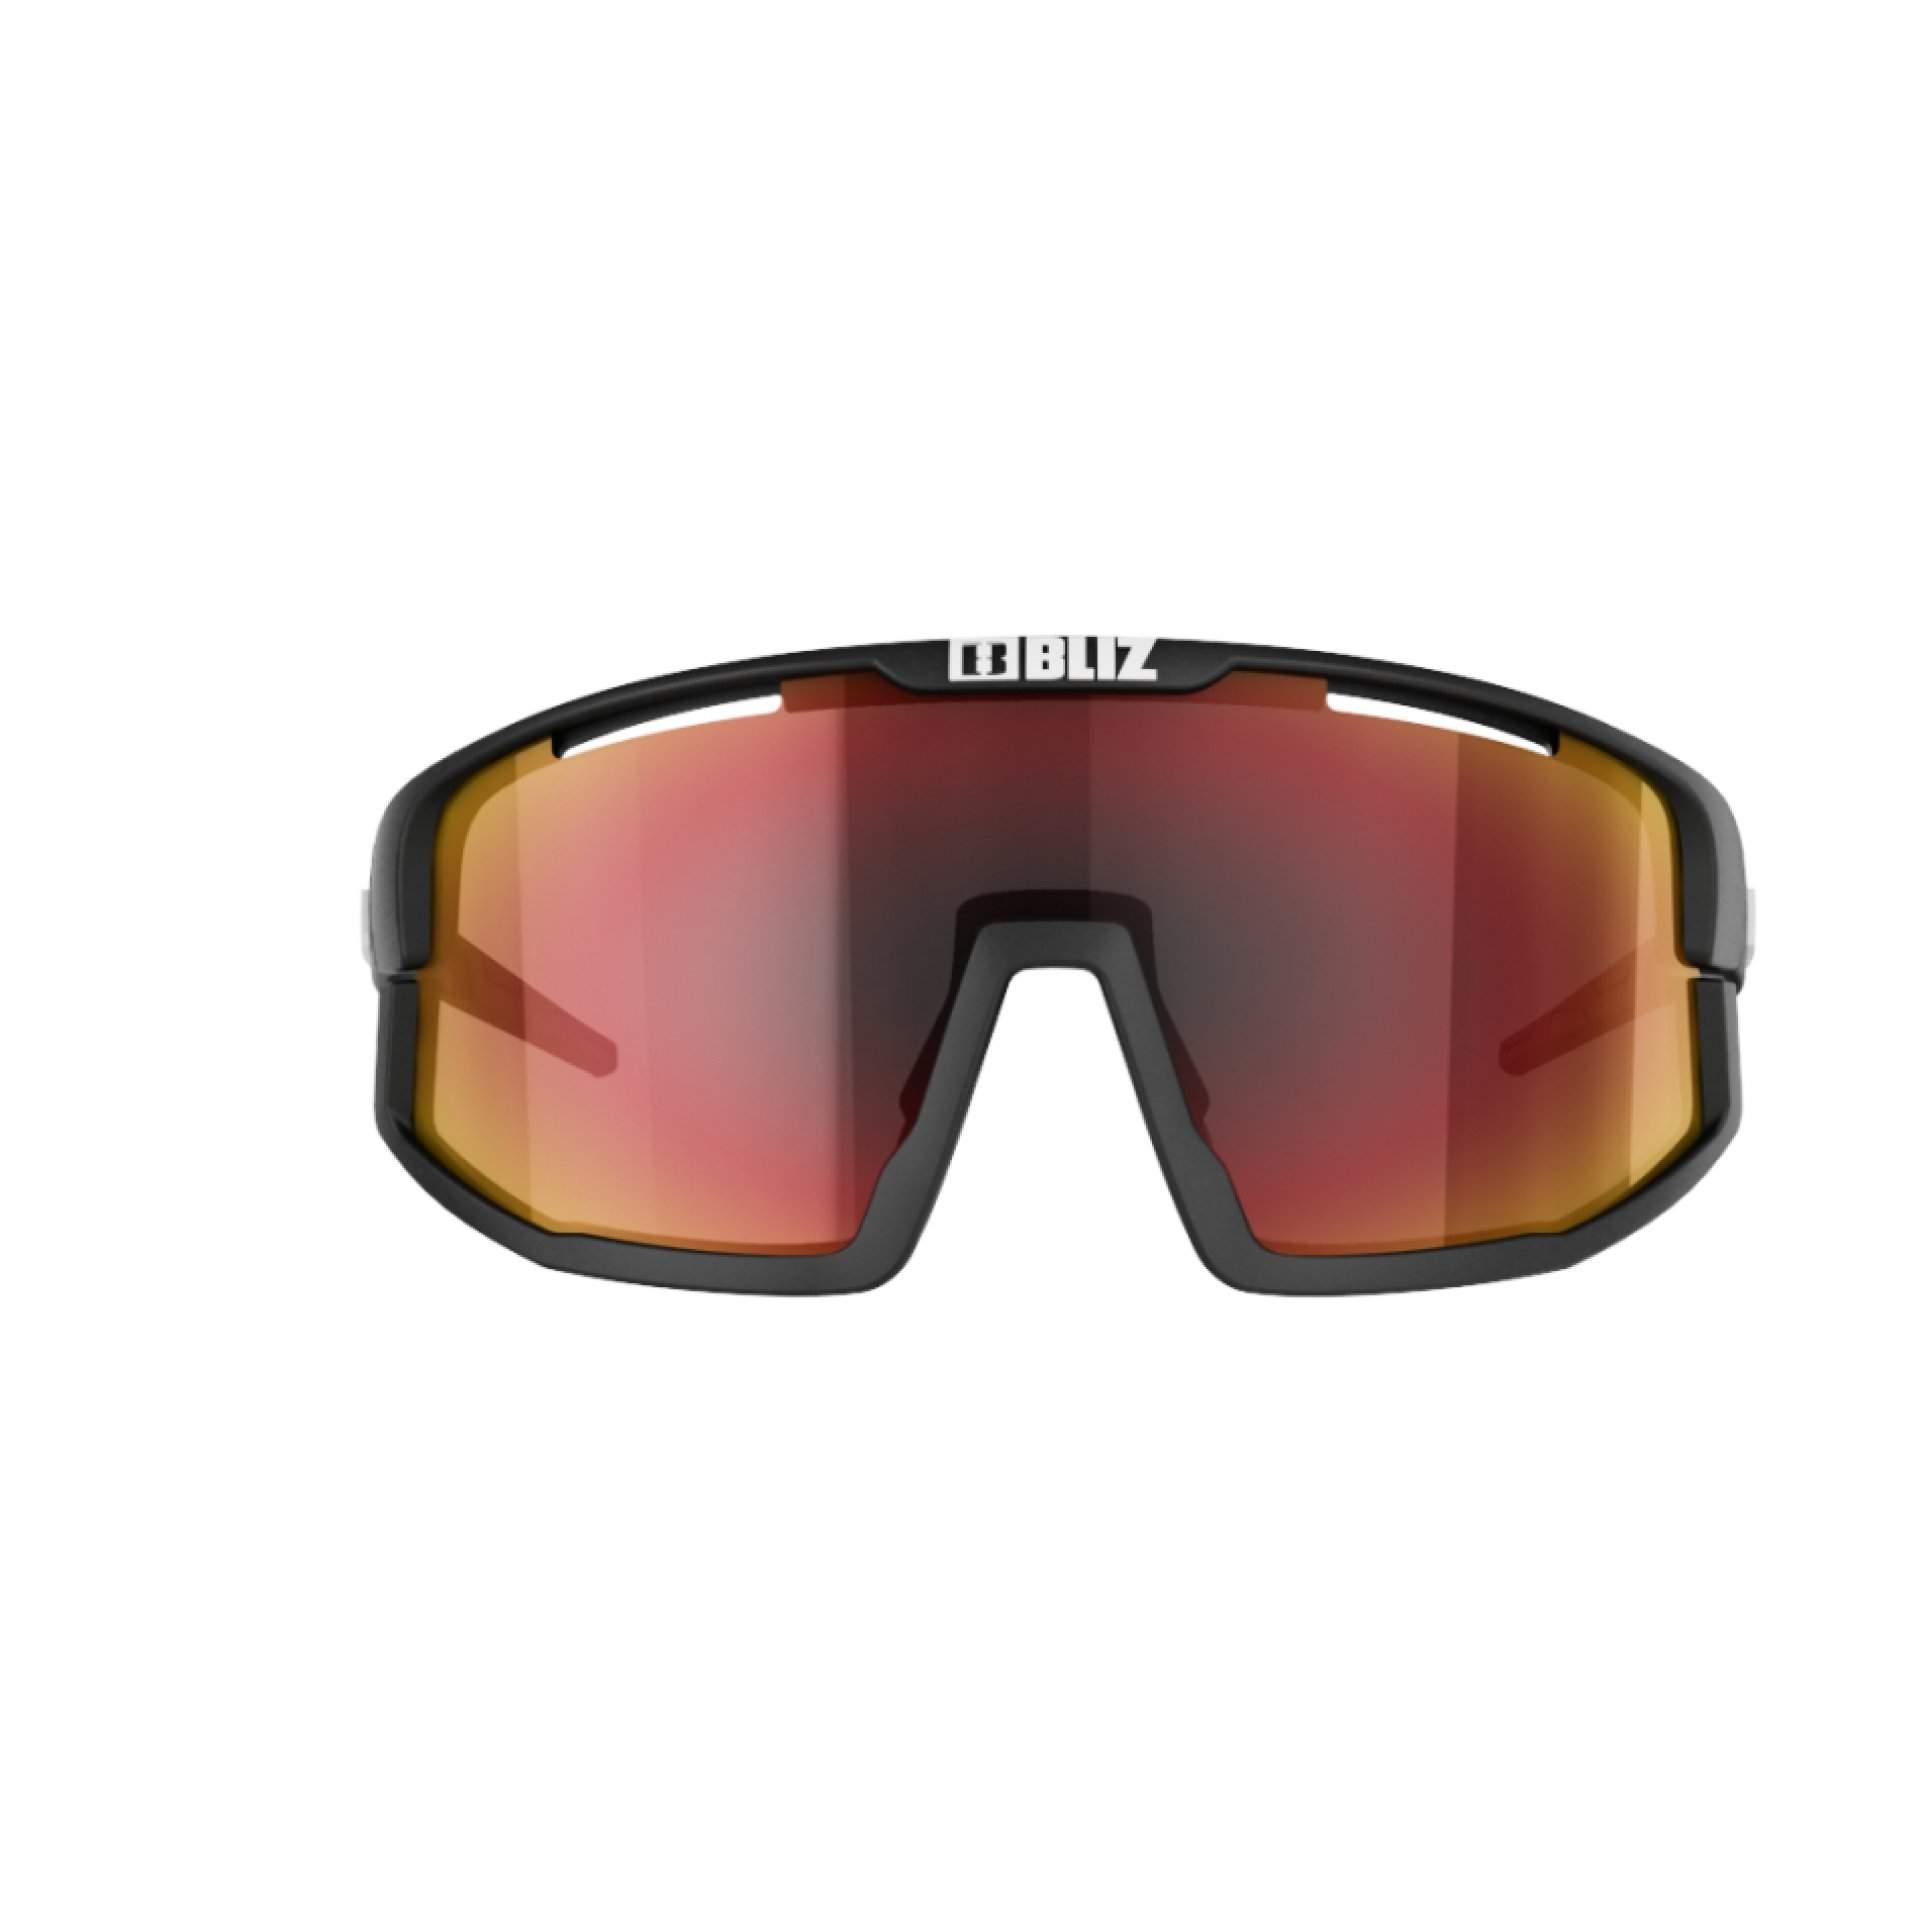 OKULARY BLIZ VISION BLACK|BROWN W RED MULTI 52001|14 Z PRZODU